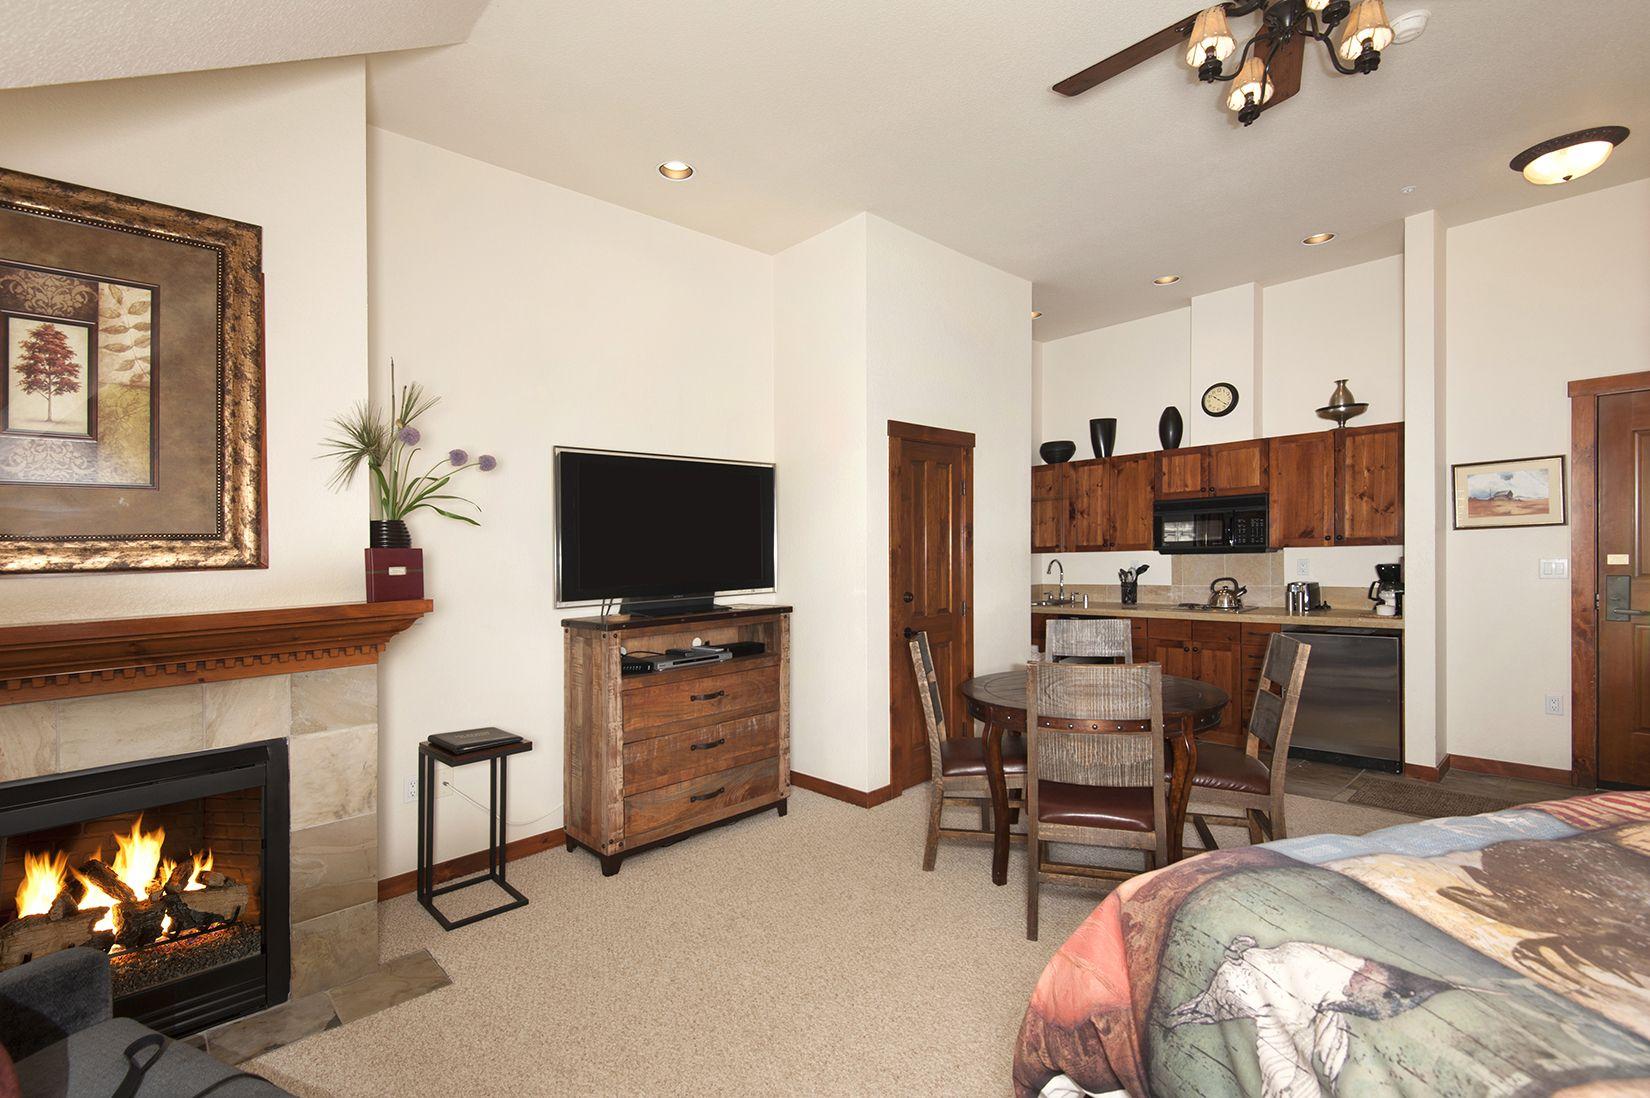 505 S Main STREET # 1504 BRECKENRIDGE, Colorado 80424